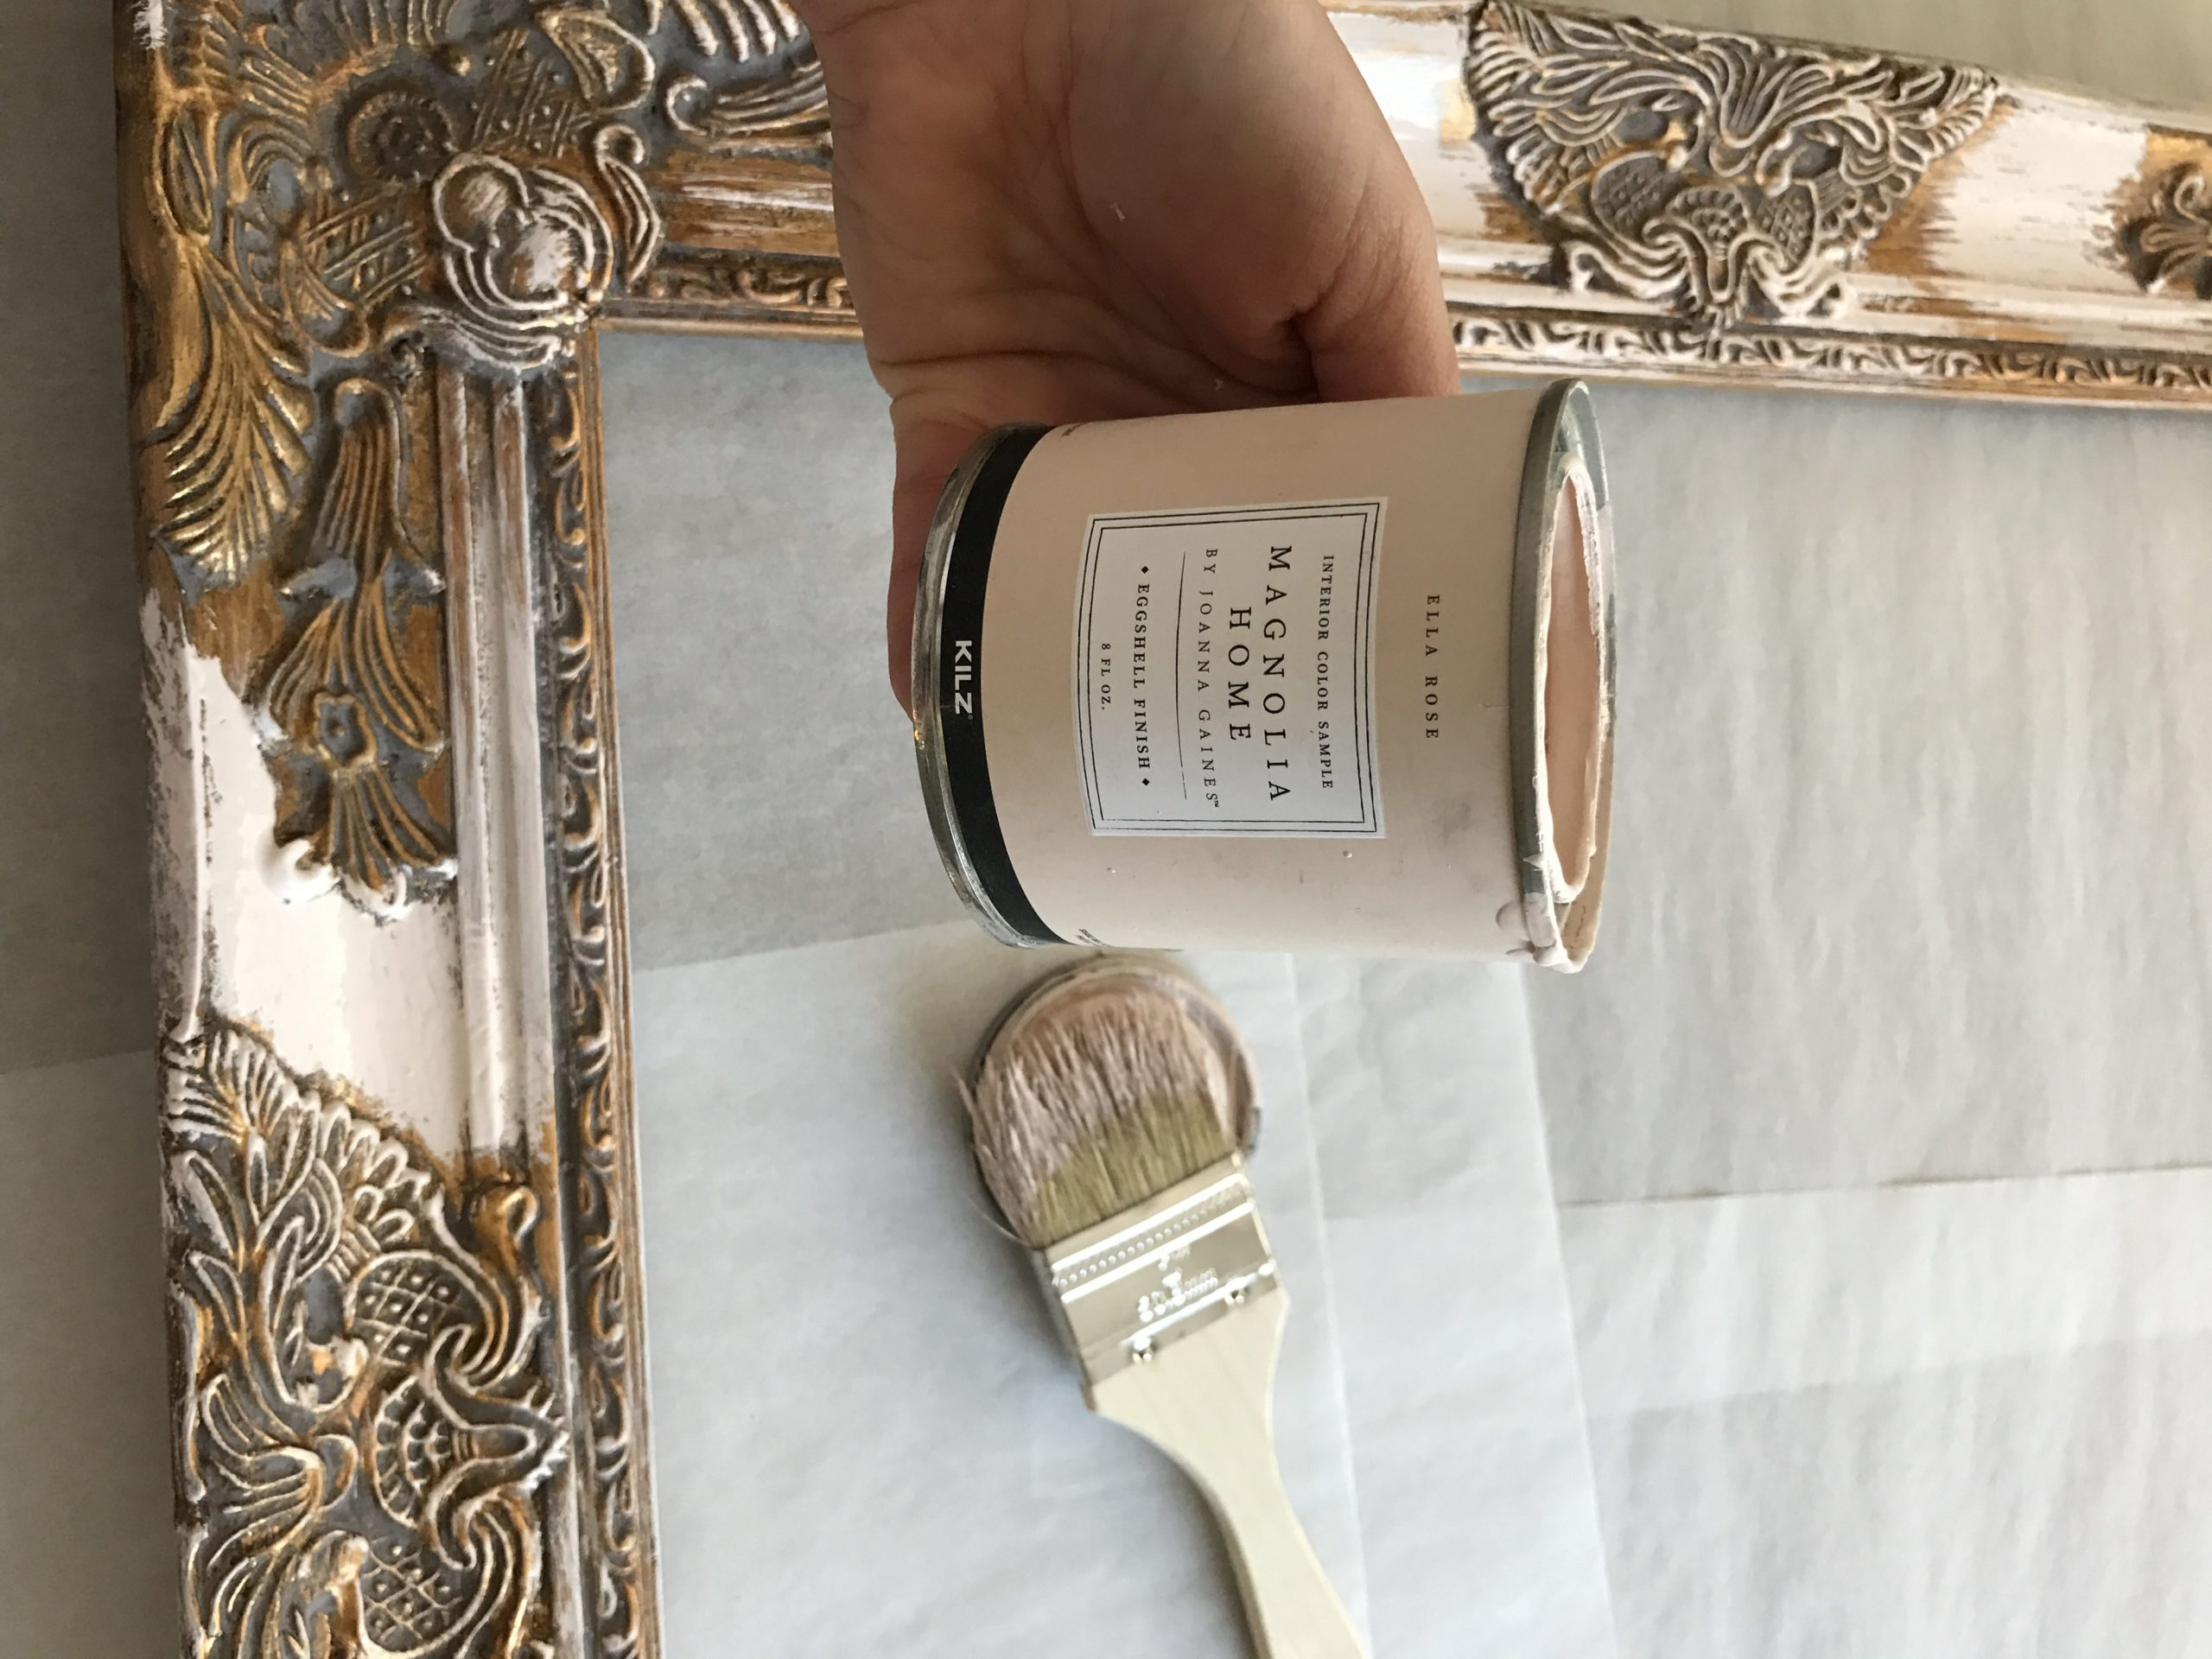 Magnolia Home Kilz Paint with Joanna Gaines